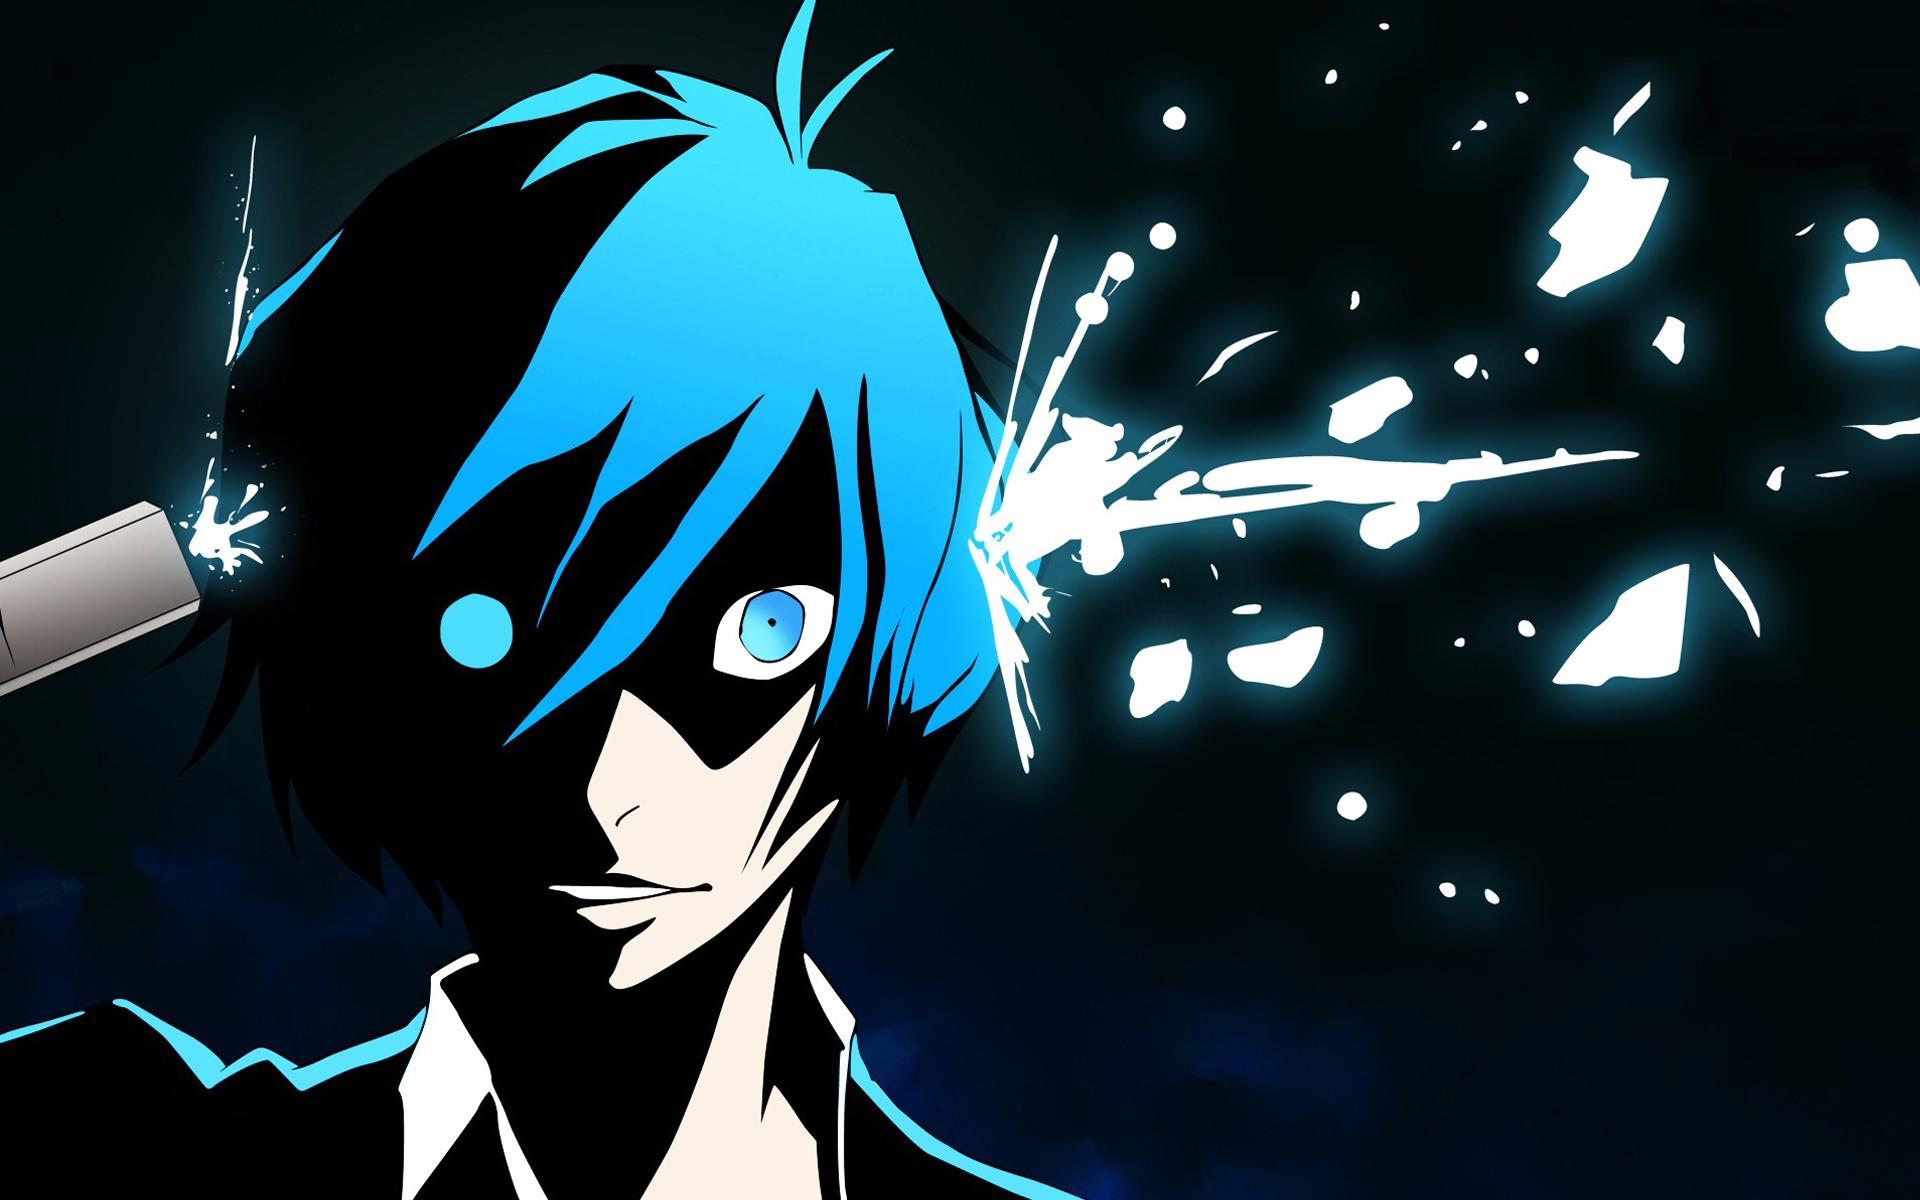 Hd wallpaper anime -  Anime Wallpaper Hd Download